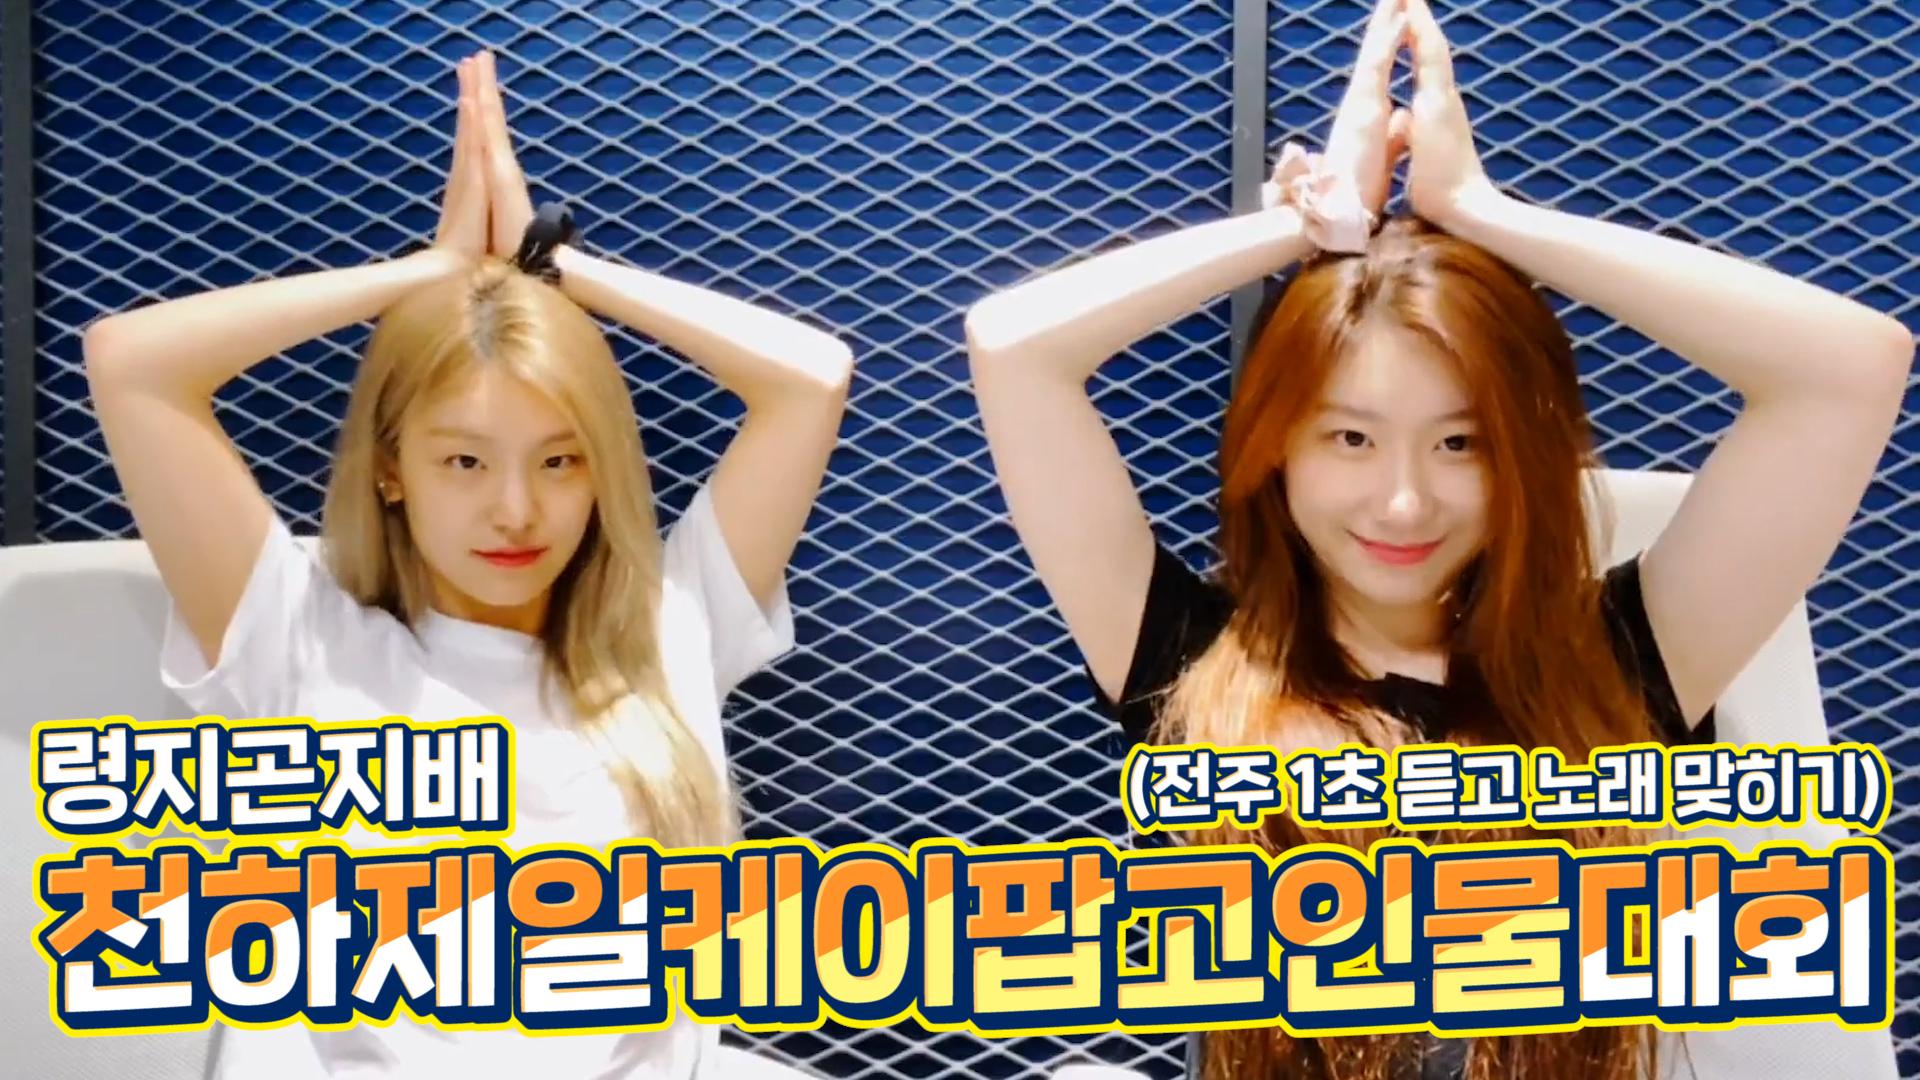 [ITZY] 💥령지곤지배 천하제일 케이팝 고인물 대회🎶 (Yeji&Chaeryeong's Guessing songs game)